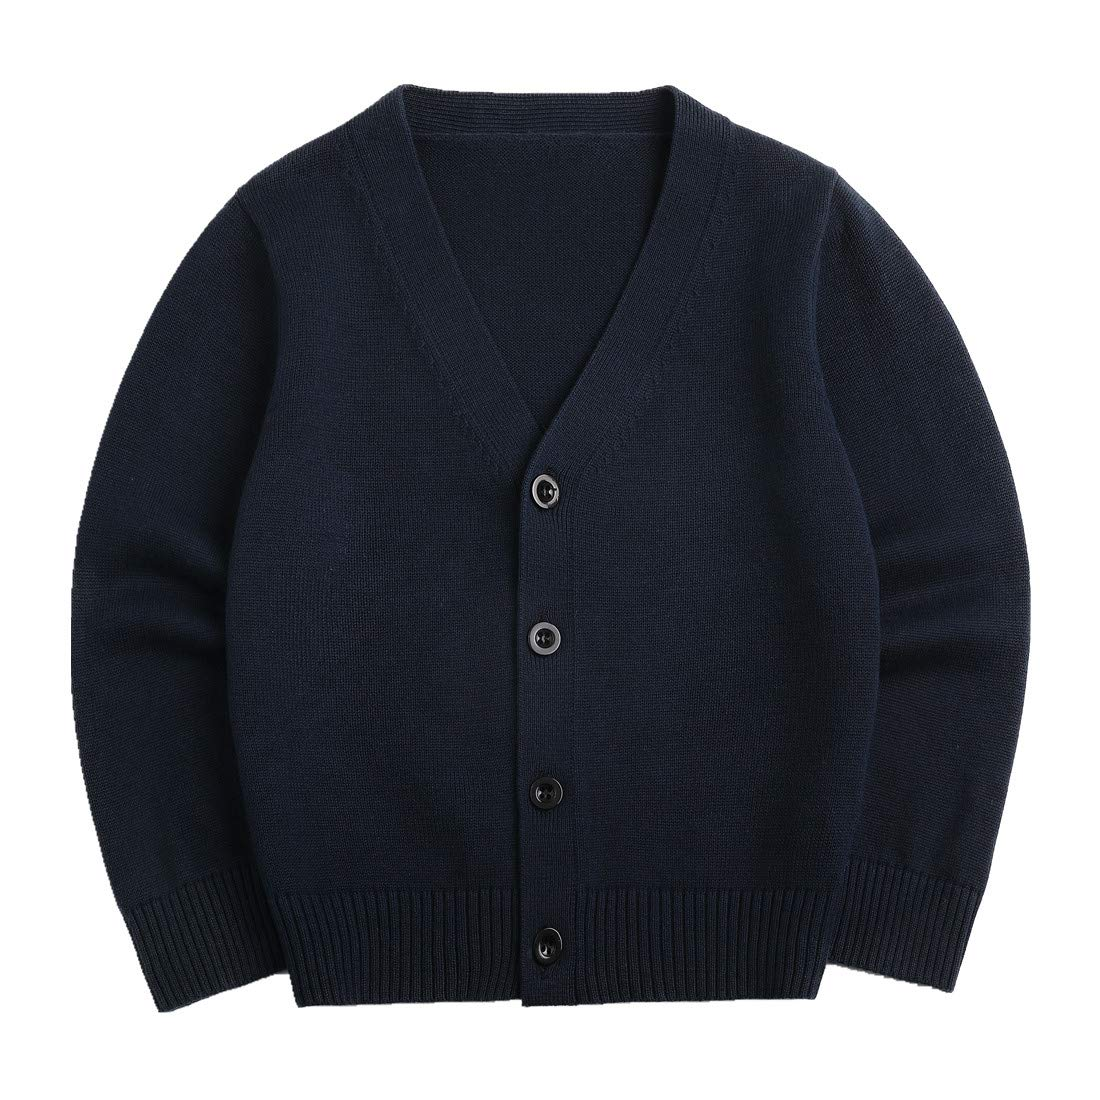 Sooxiwood Little Boys Cardigan Coat V-Neck Striped Size 6 Navy